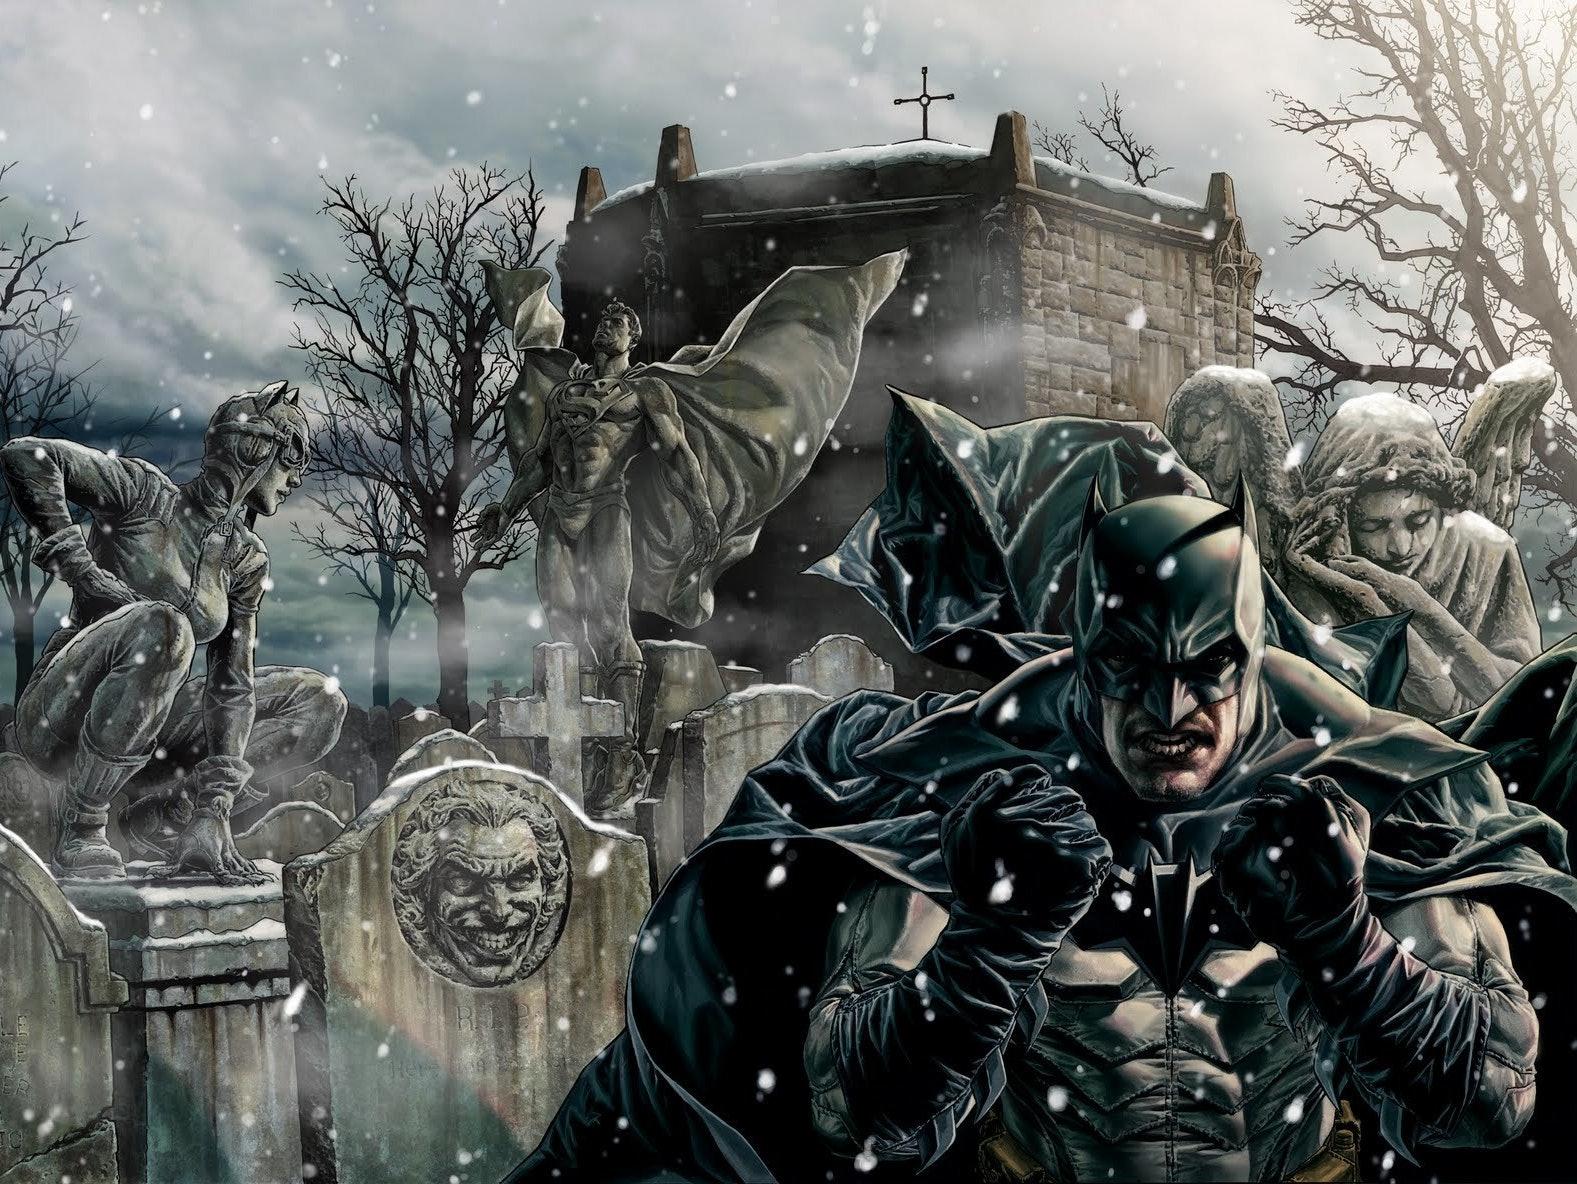 5 Dark Christmas Comics to Read Through the Holidays